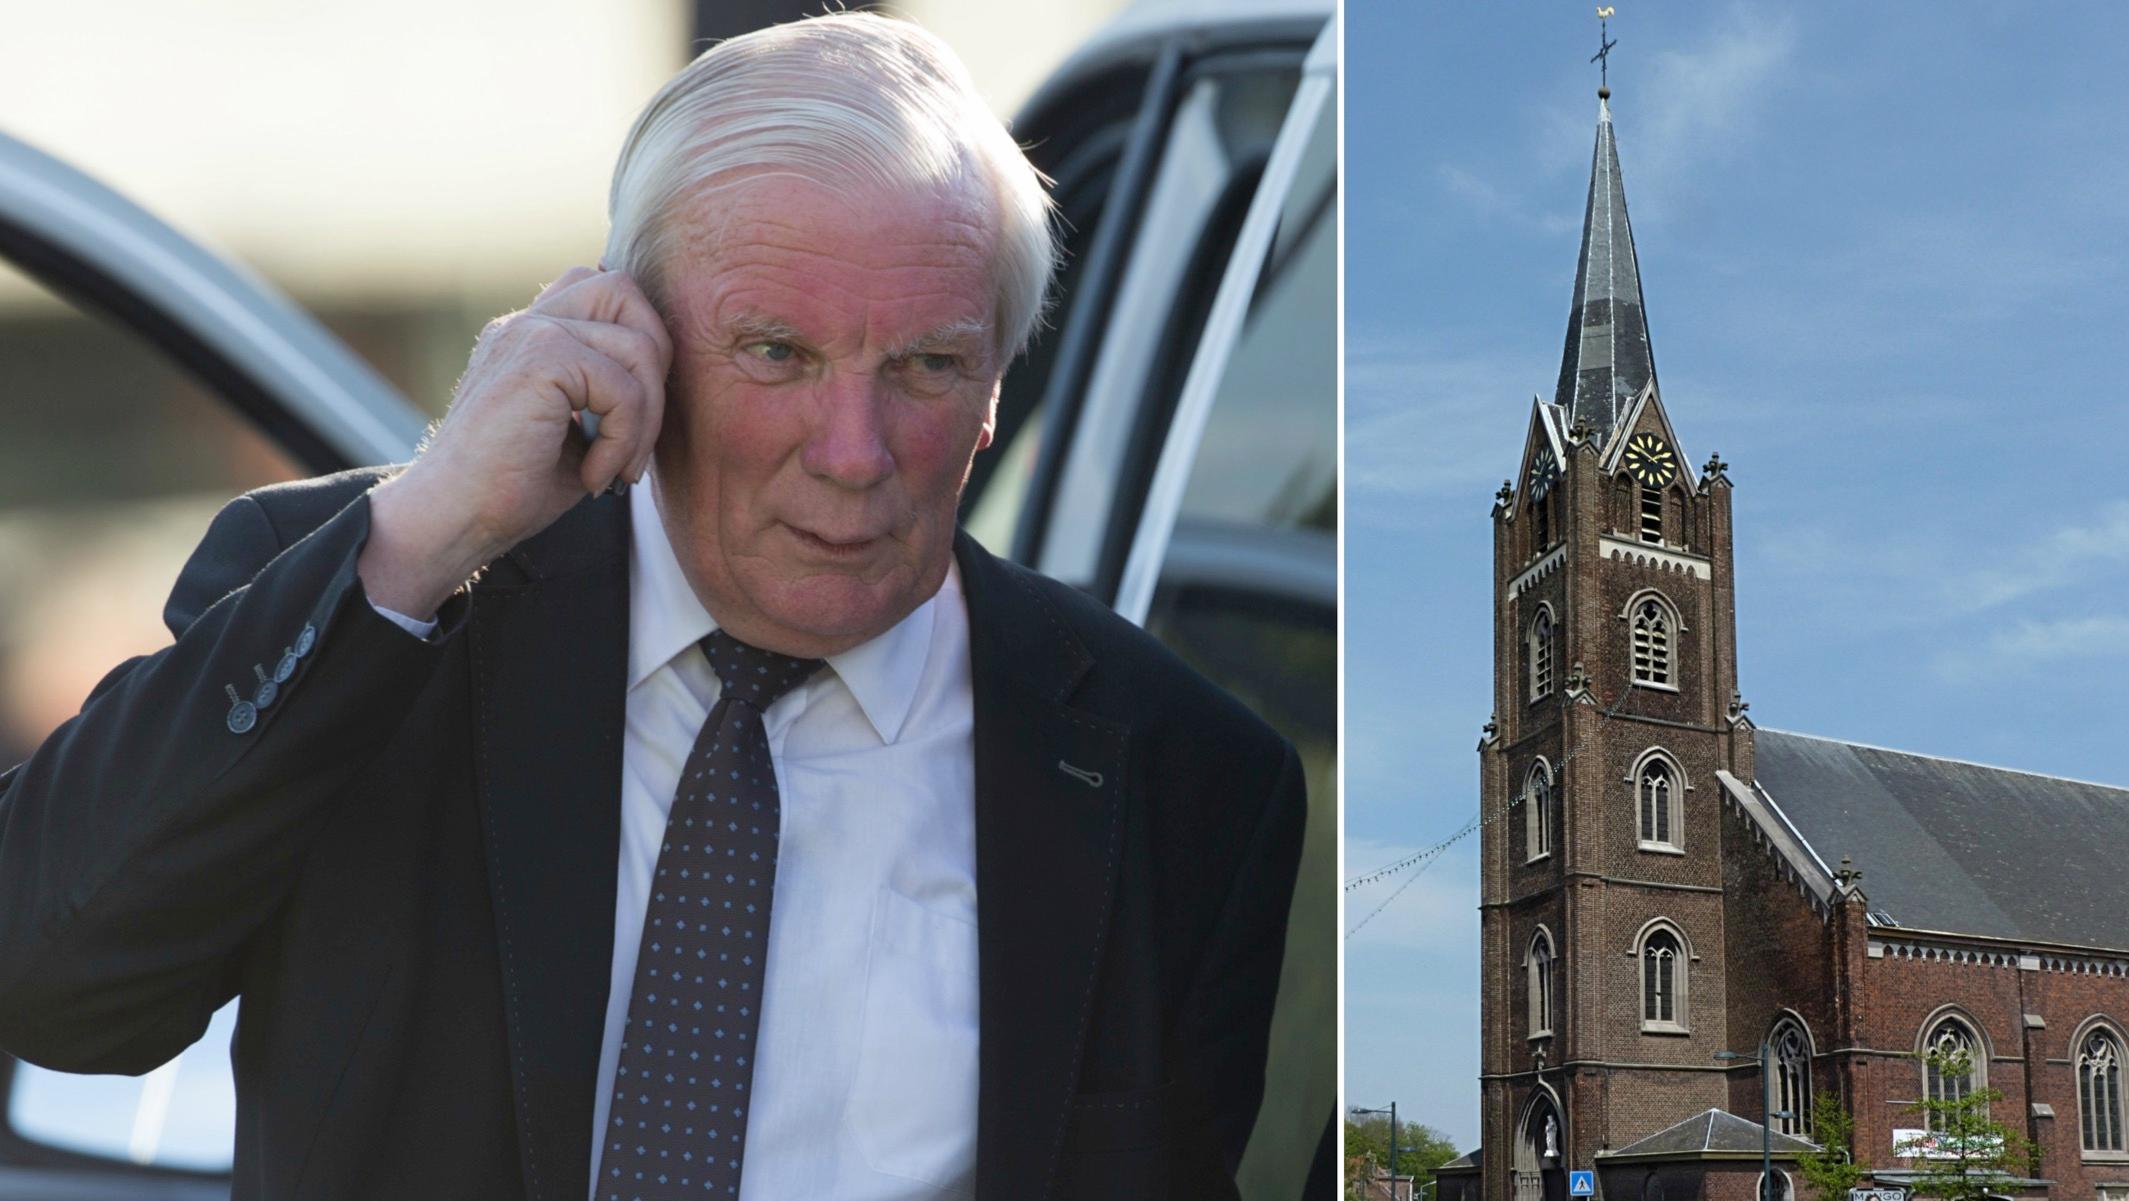 Les funérailles d'Alfred Gadenne auront lieu ce samedi à Luingne